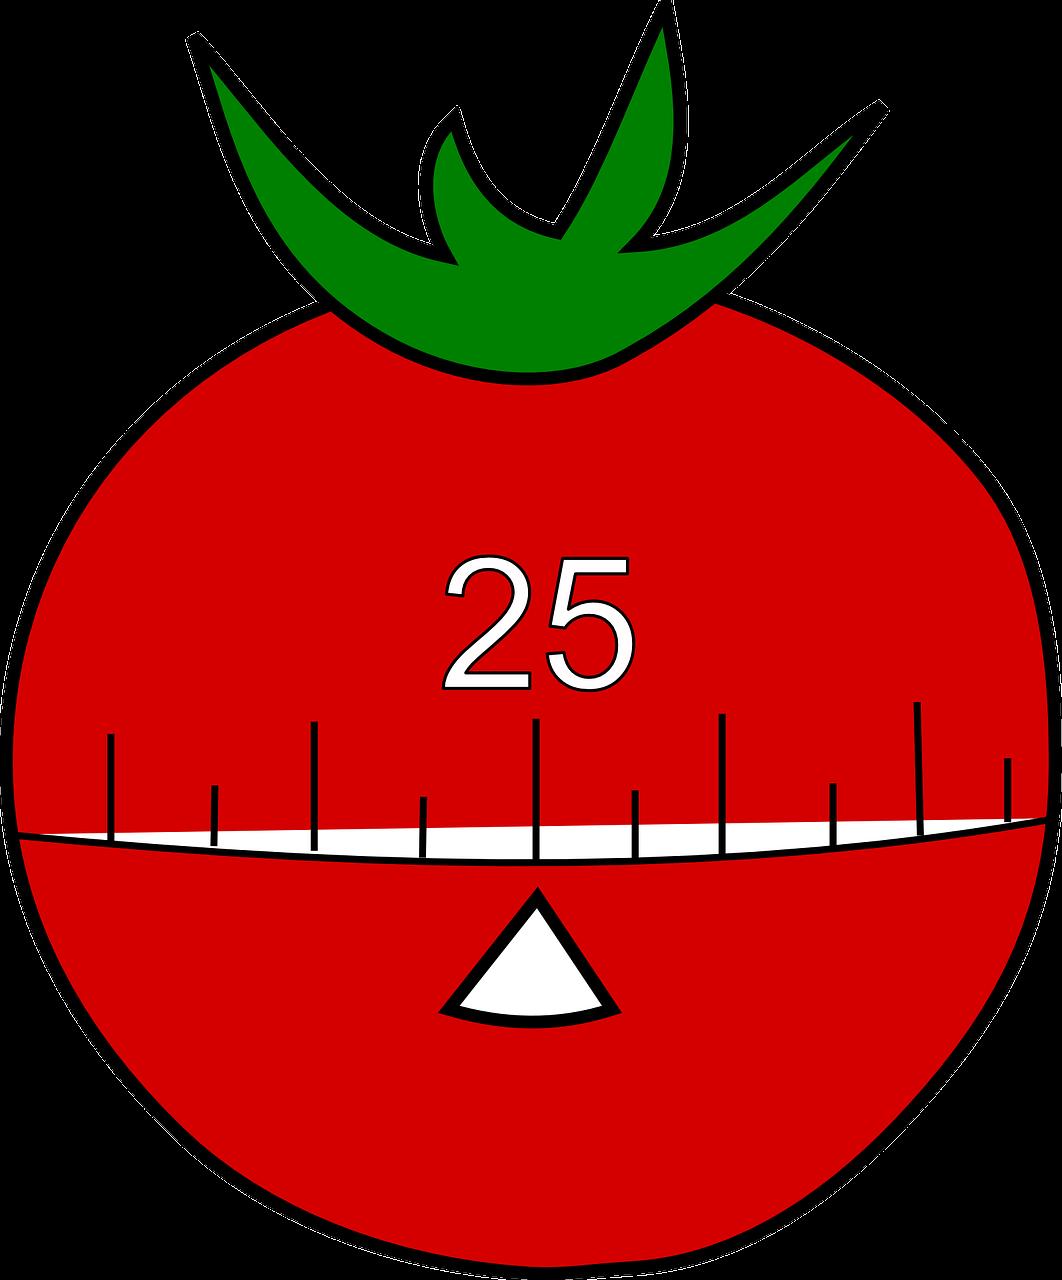 Time Management Using the Pomodoro Technique